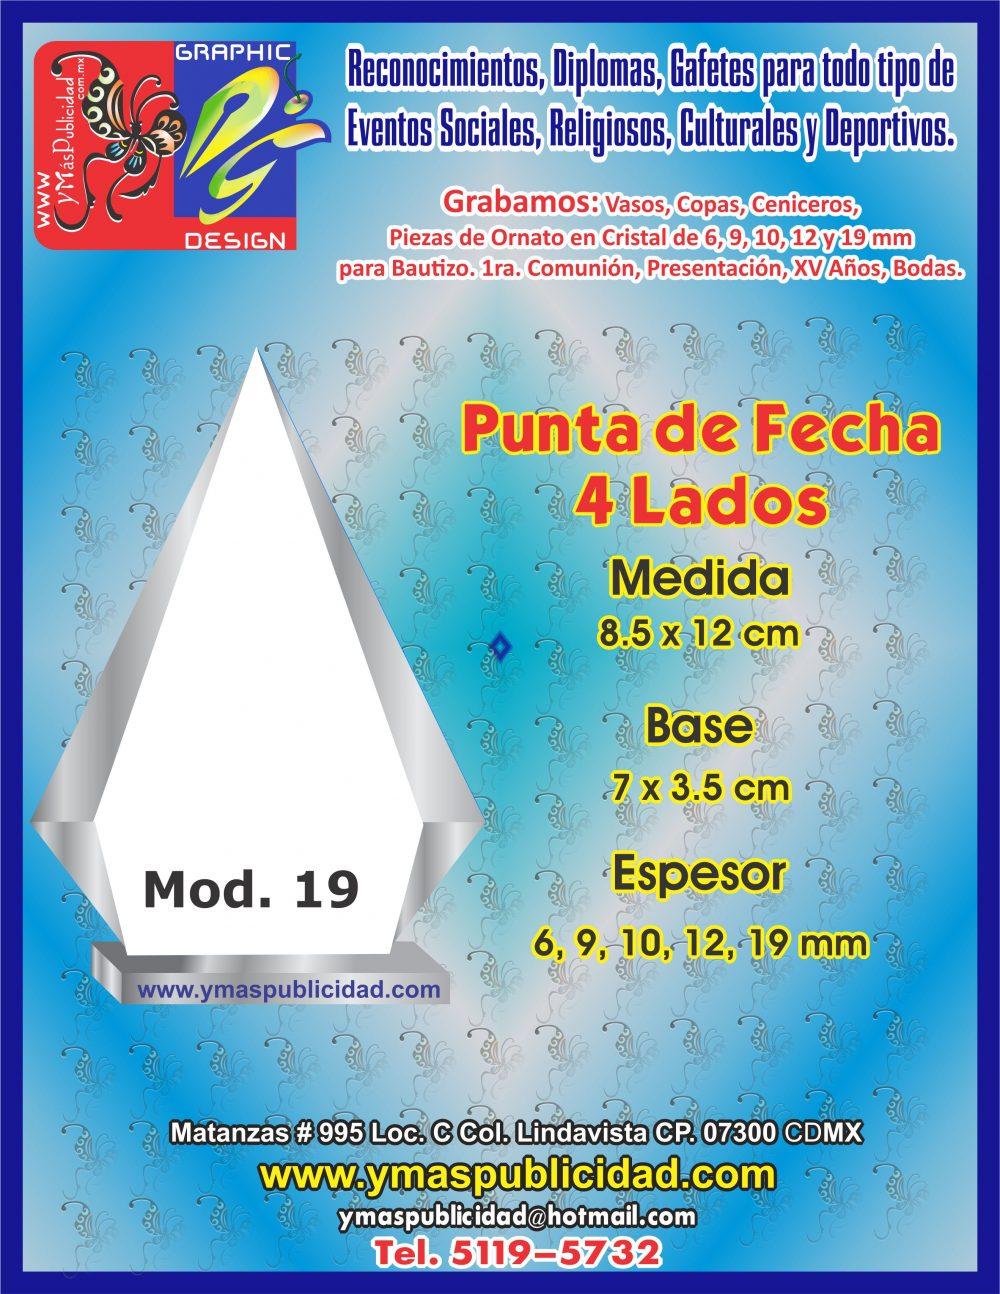 PUNTA DE FLECHA 4 LADOS